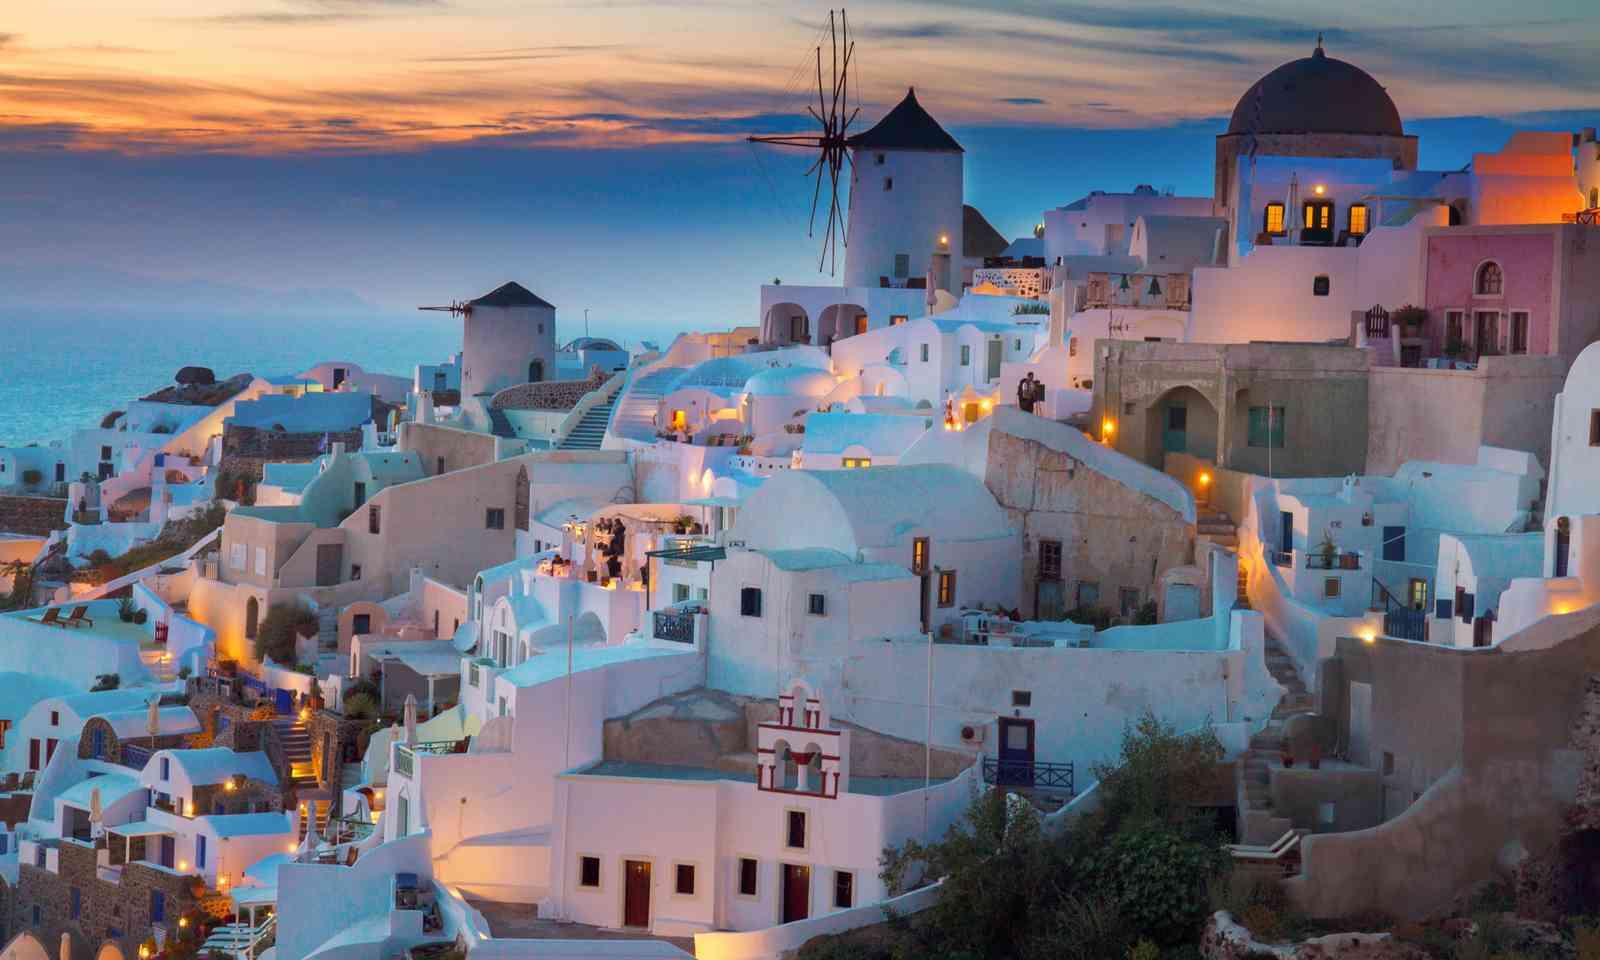 Greek island of Oia at sunset (Shutterstock.com)